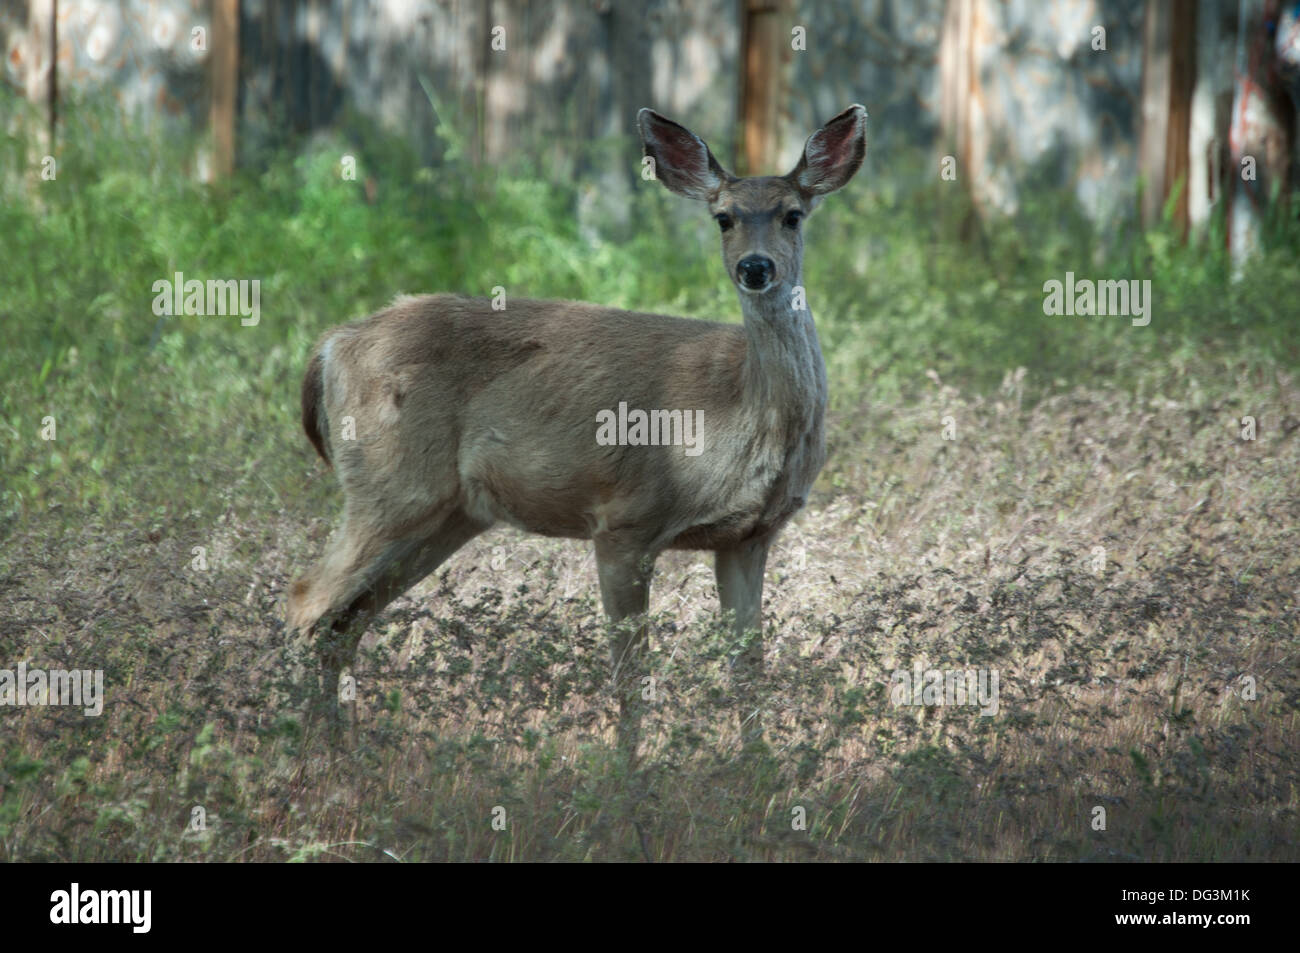 Doe Blacktail deer in a backyard,Yreka,California. - Stock Image